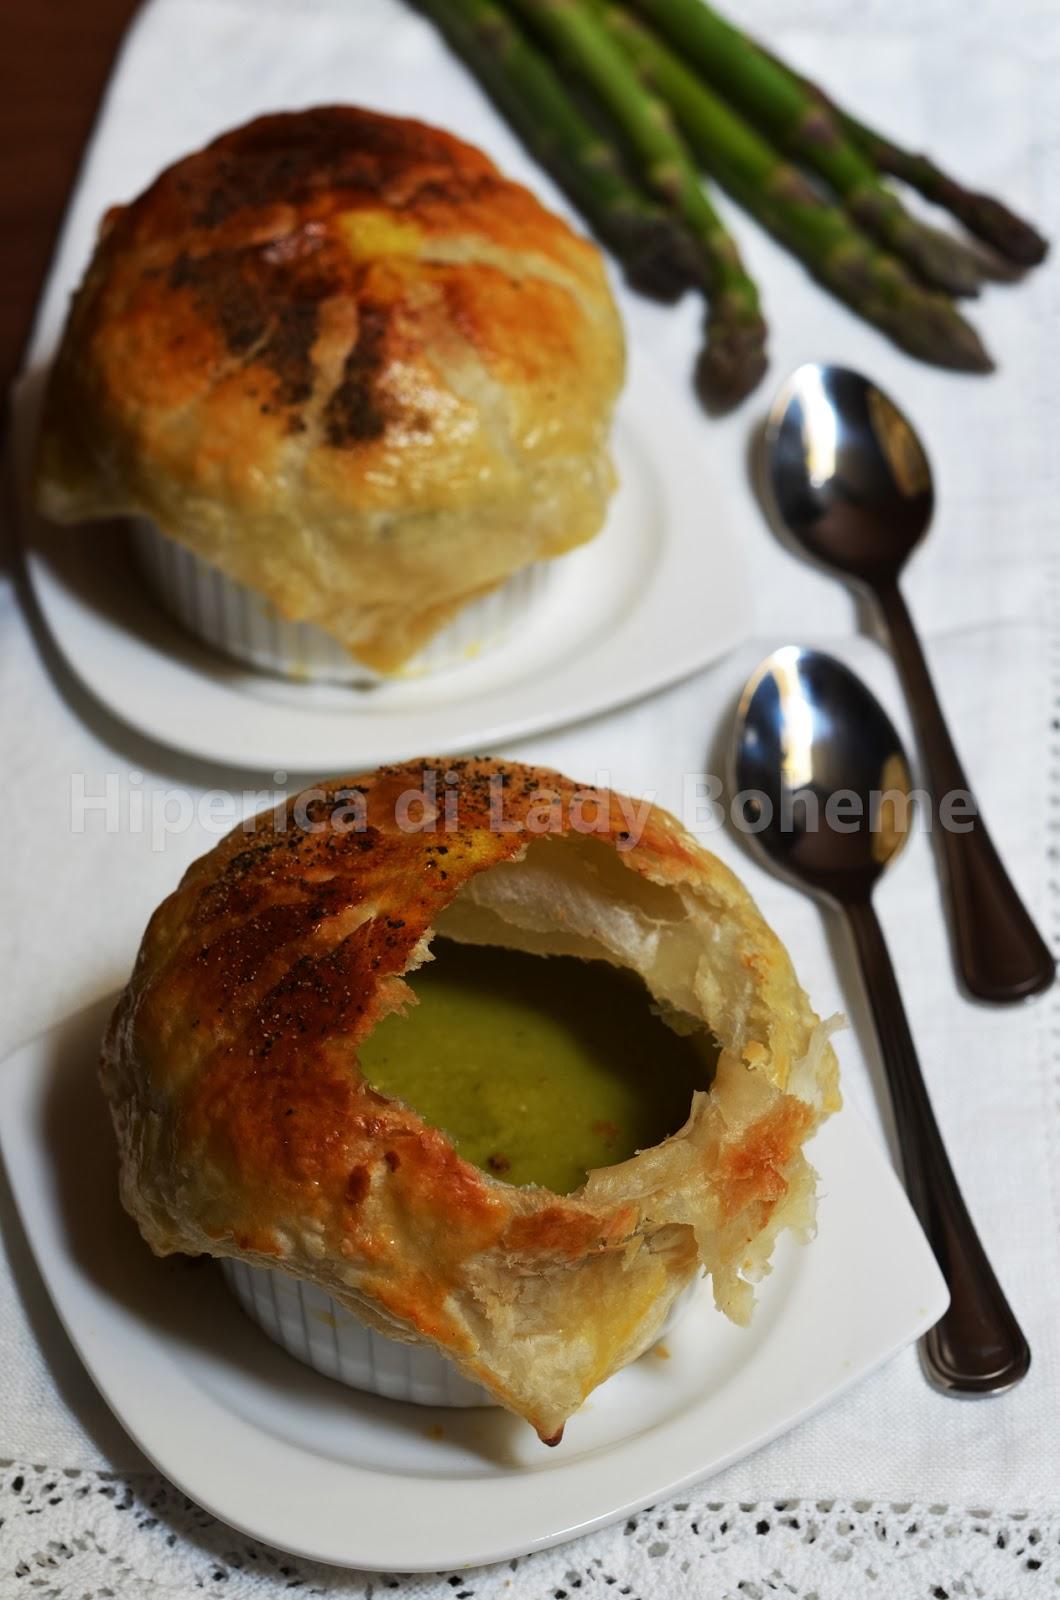 hiperica_lady_boheme_blog_di_cucina_ricette_gustose_facili_veloci_crema_di_asparagi_in_crosta_2